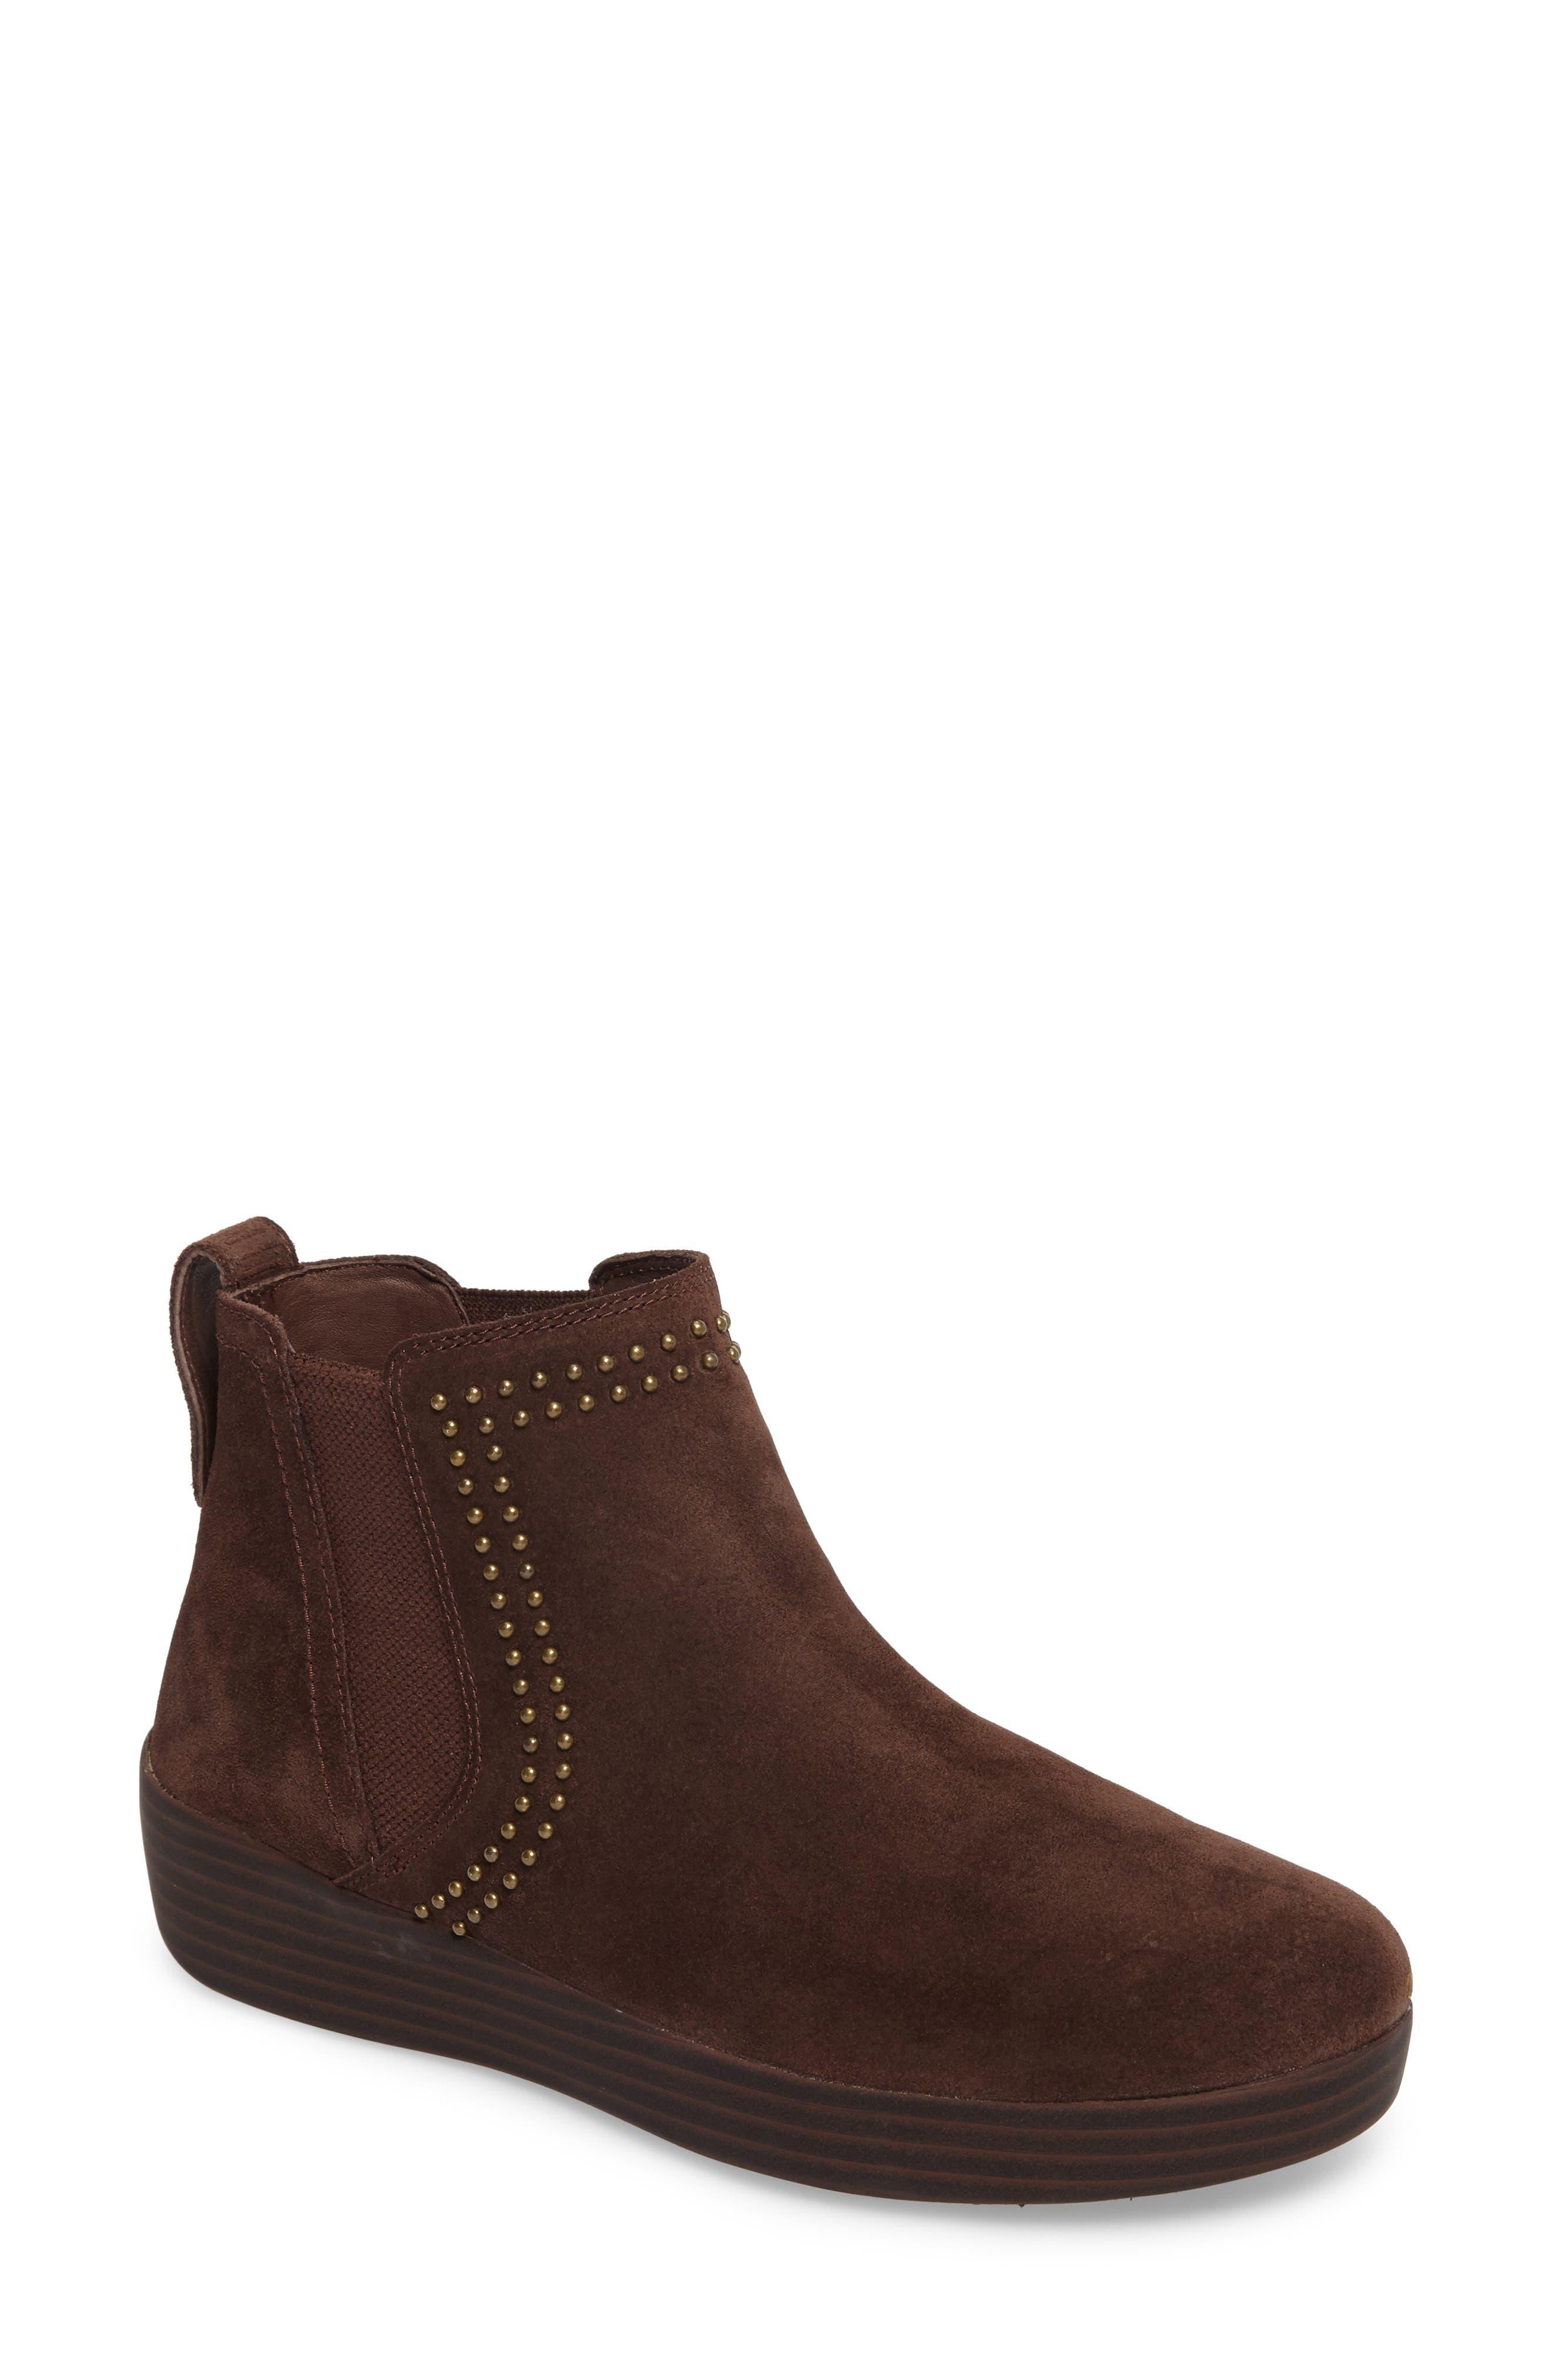 Superchelsea Studded Boot,                             Main thumbnail 1, color,                             Chocolate